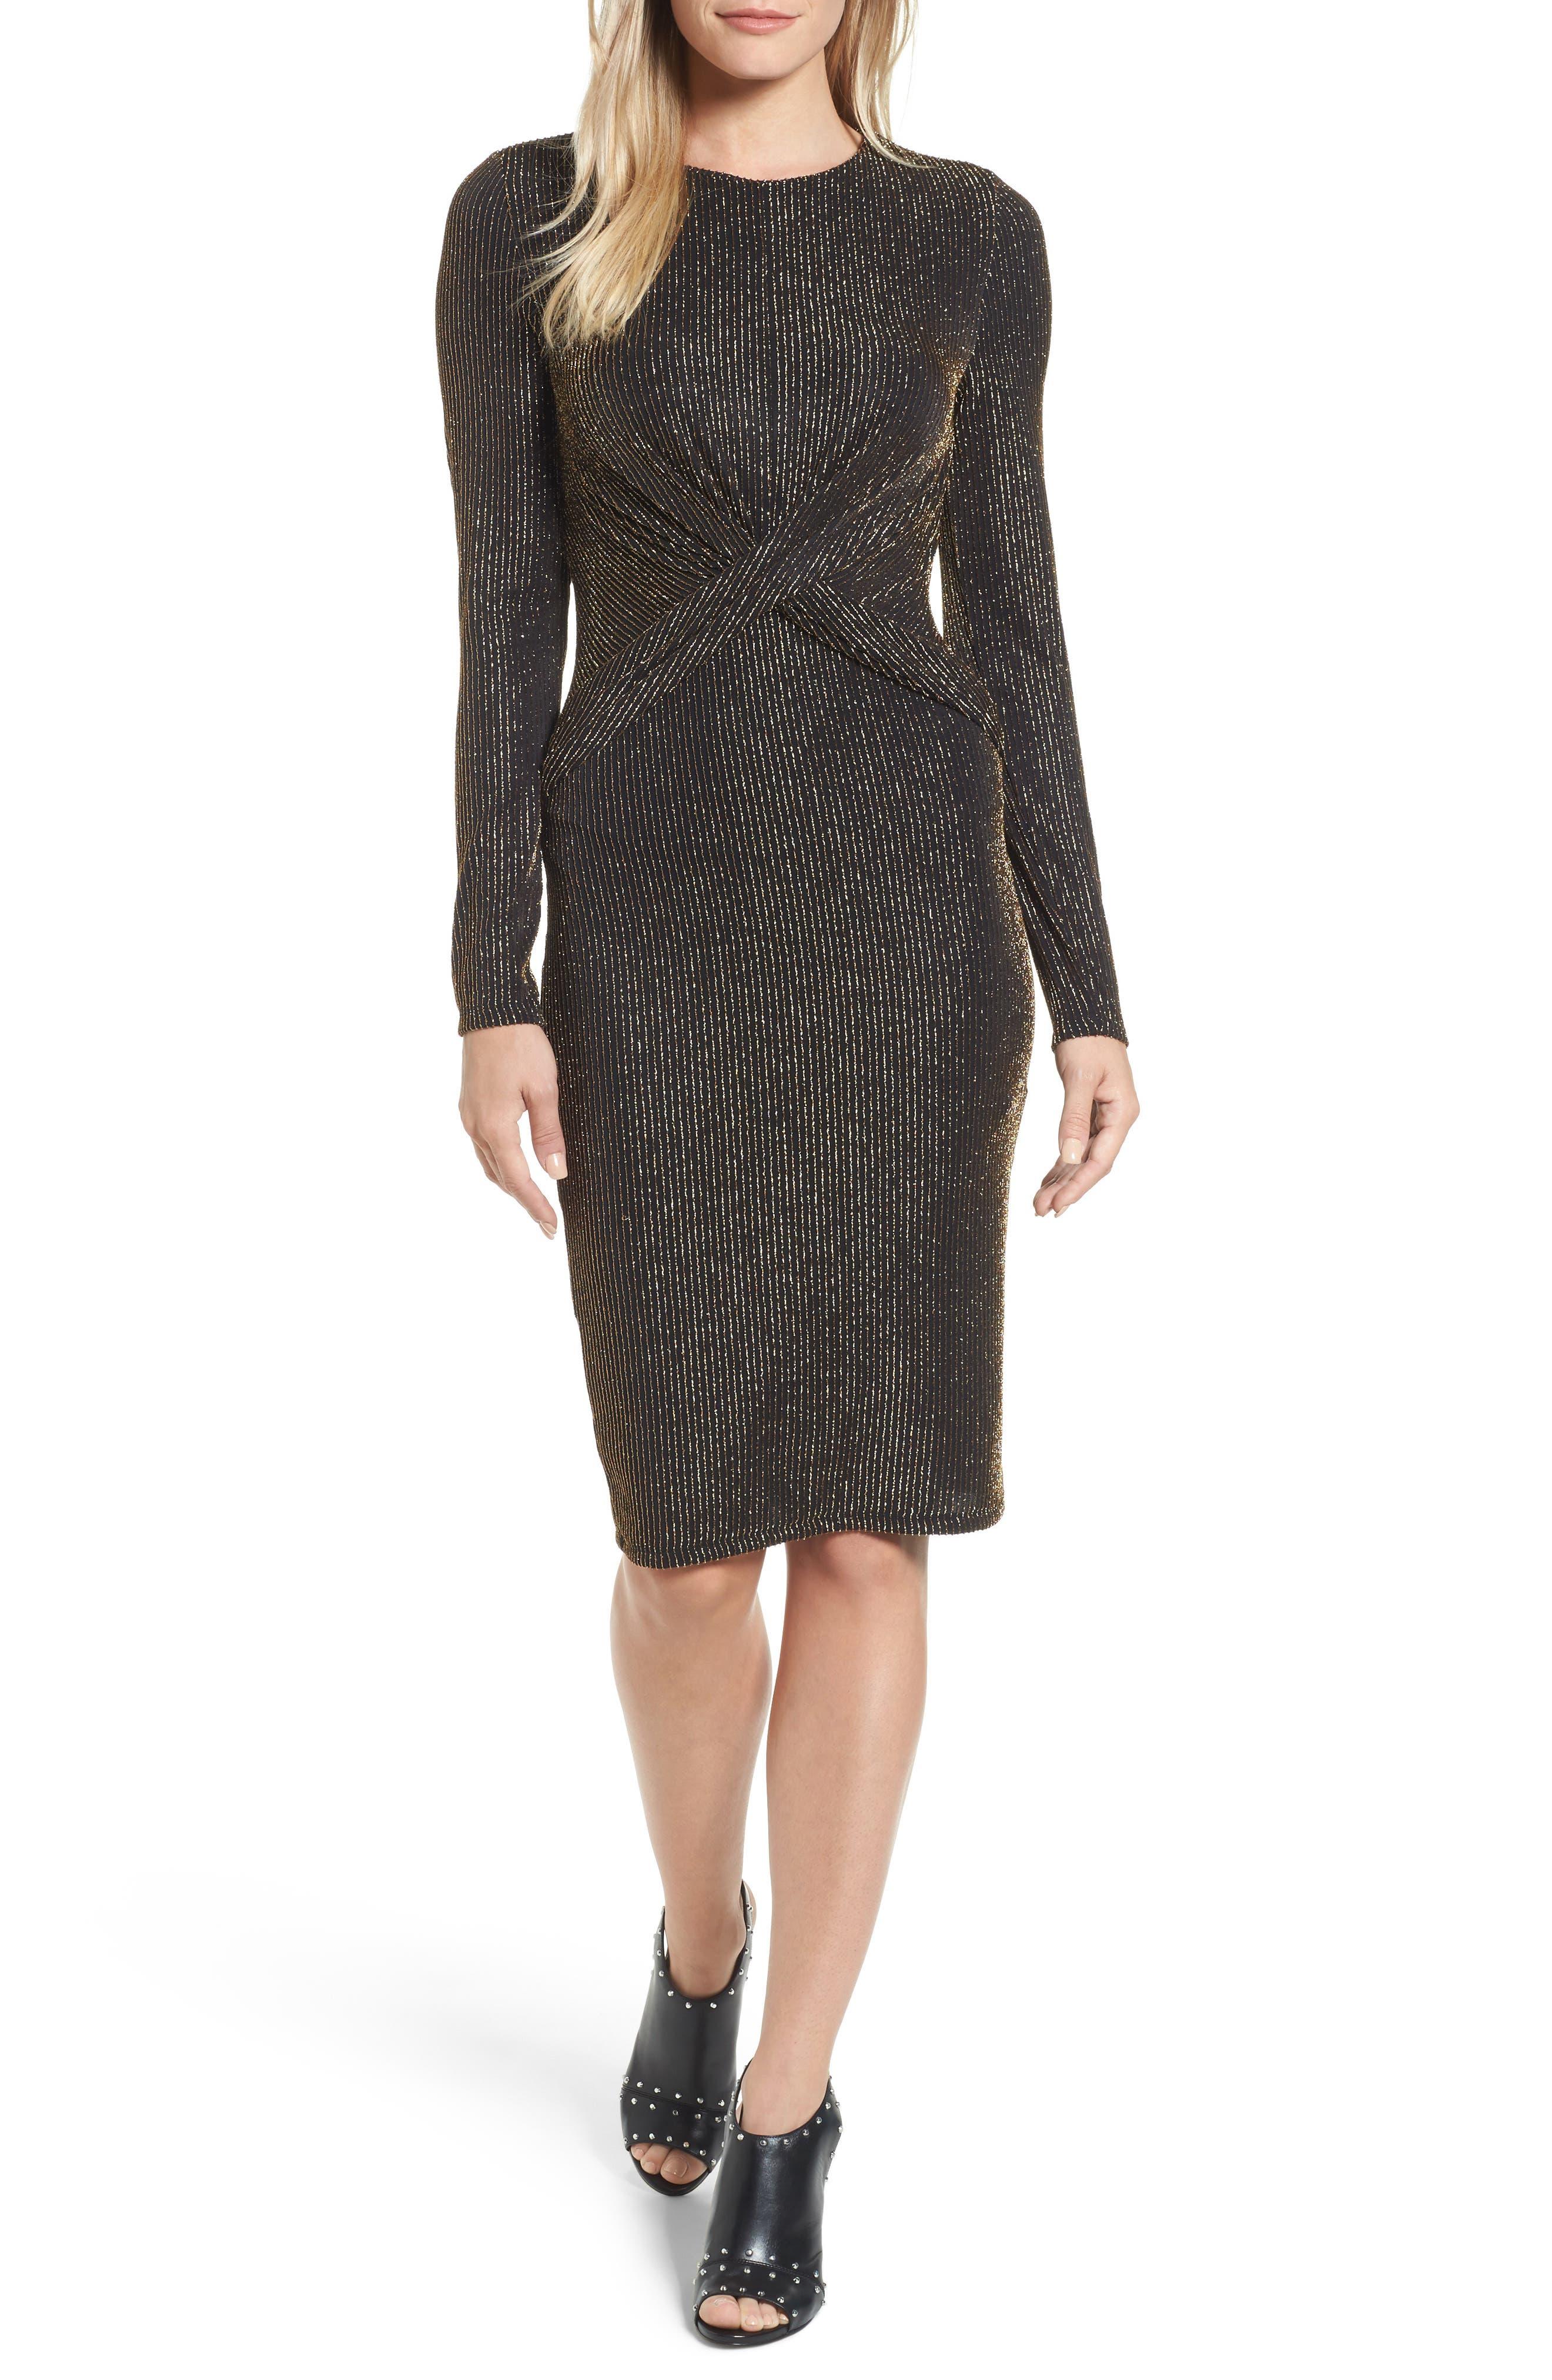 MICHAEL Michael Kors Twist Waist Metallic Dress